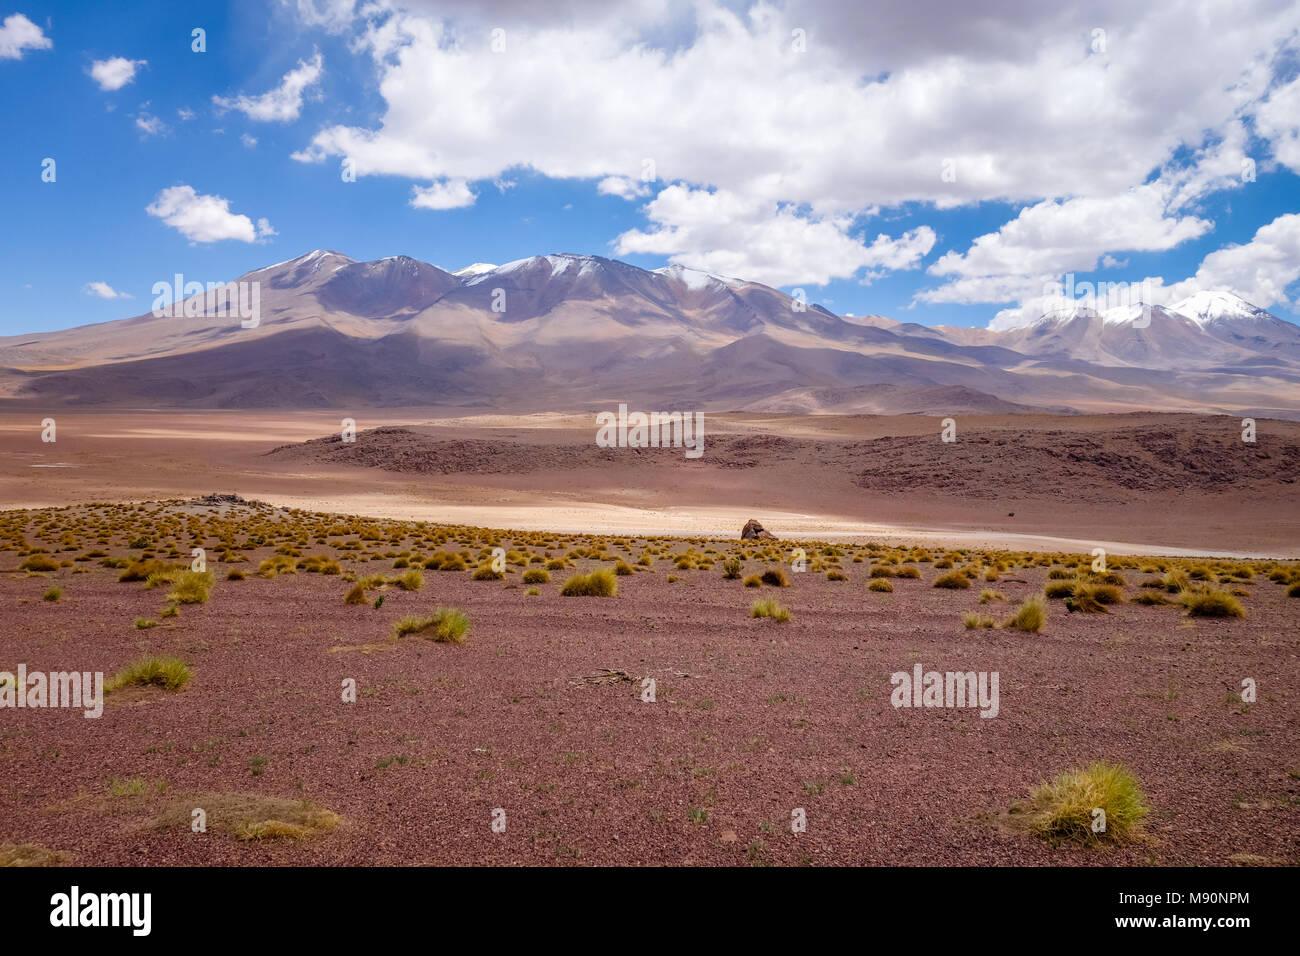 Altiplano mountains in sud Lipez reserva Eduardo Avaroa, Bolivia - Stock Image